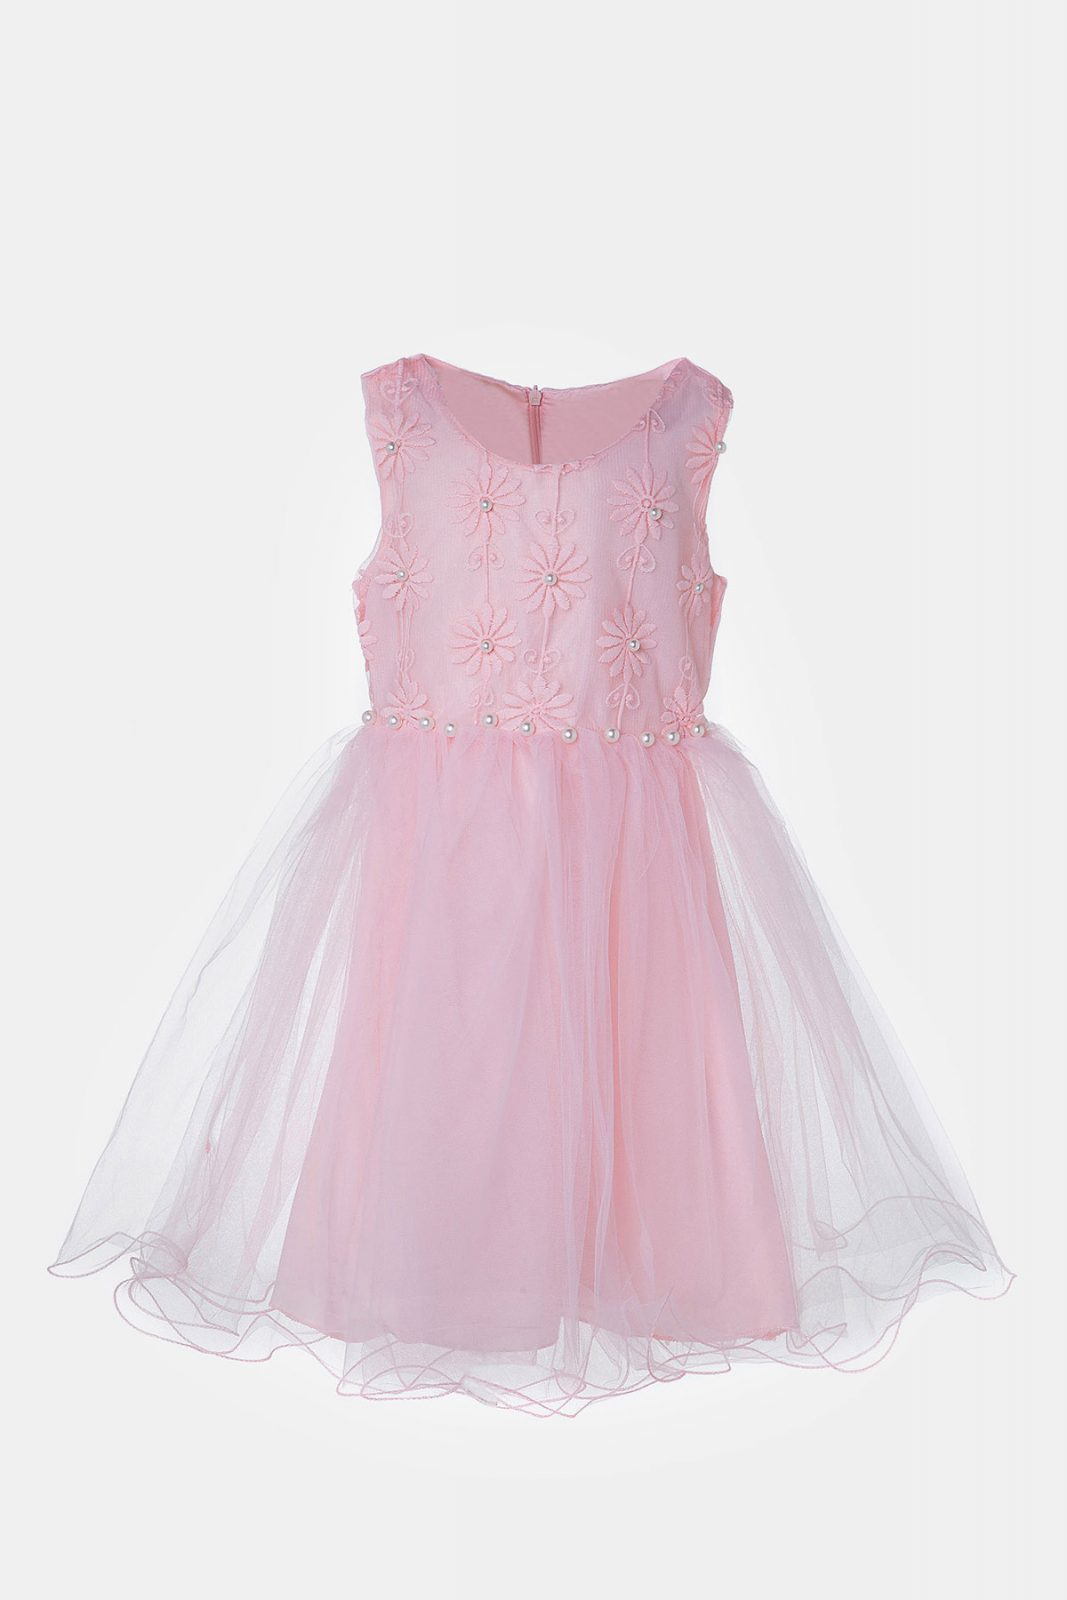 cda3fee9b56 Φόρεμα παιδικό με τούλι - Ersas Παιδικά, Βρεφικά Ρούχα